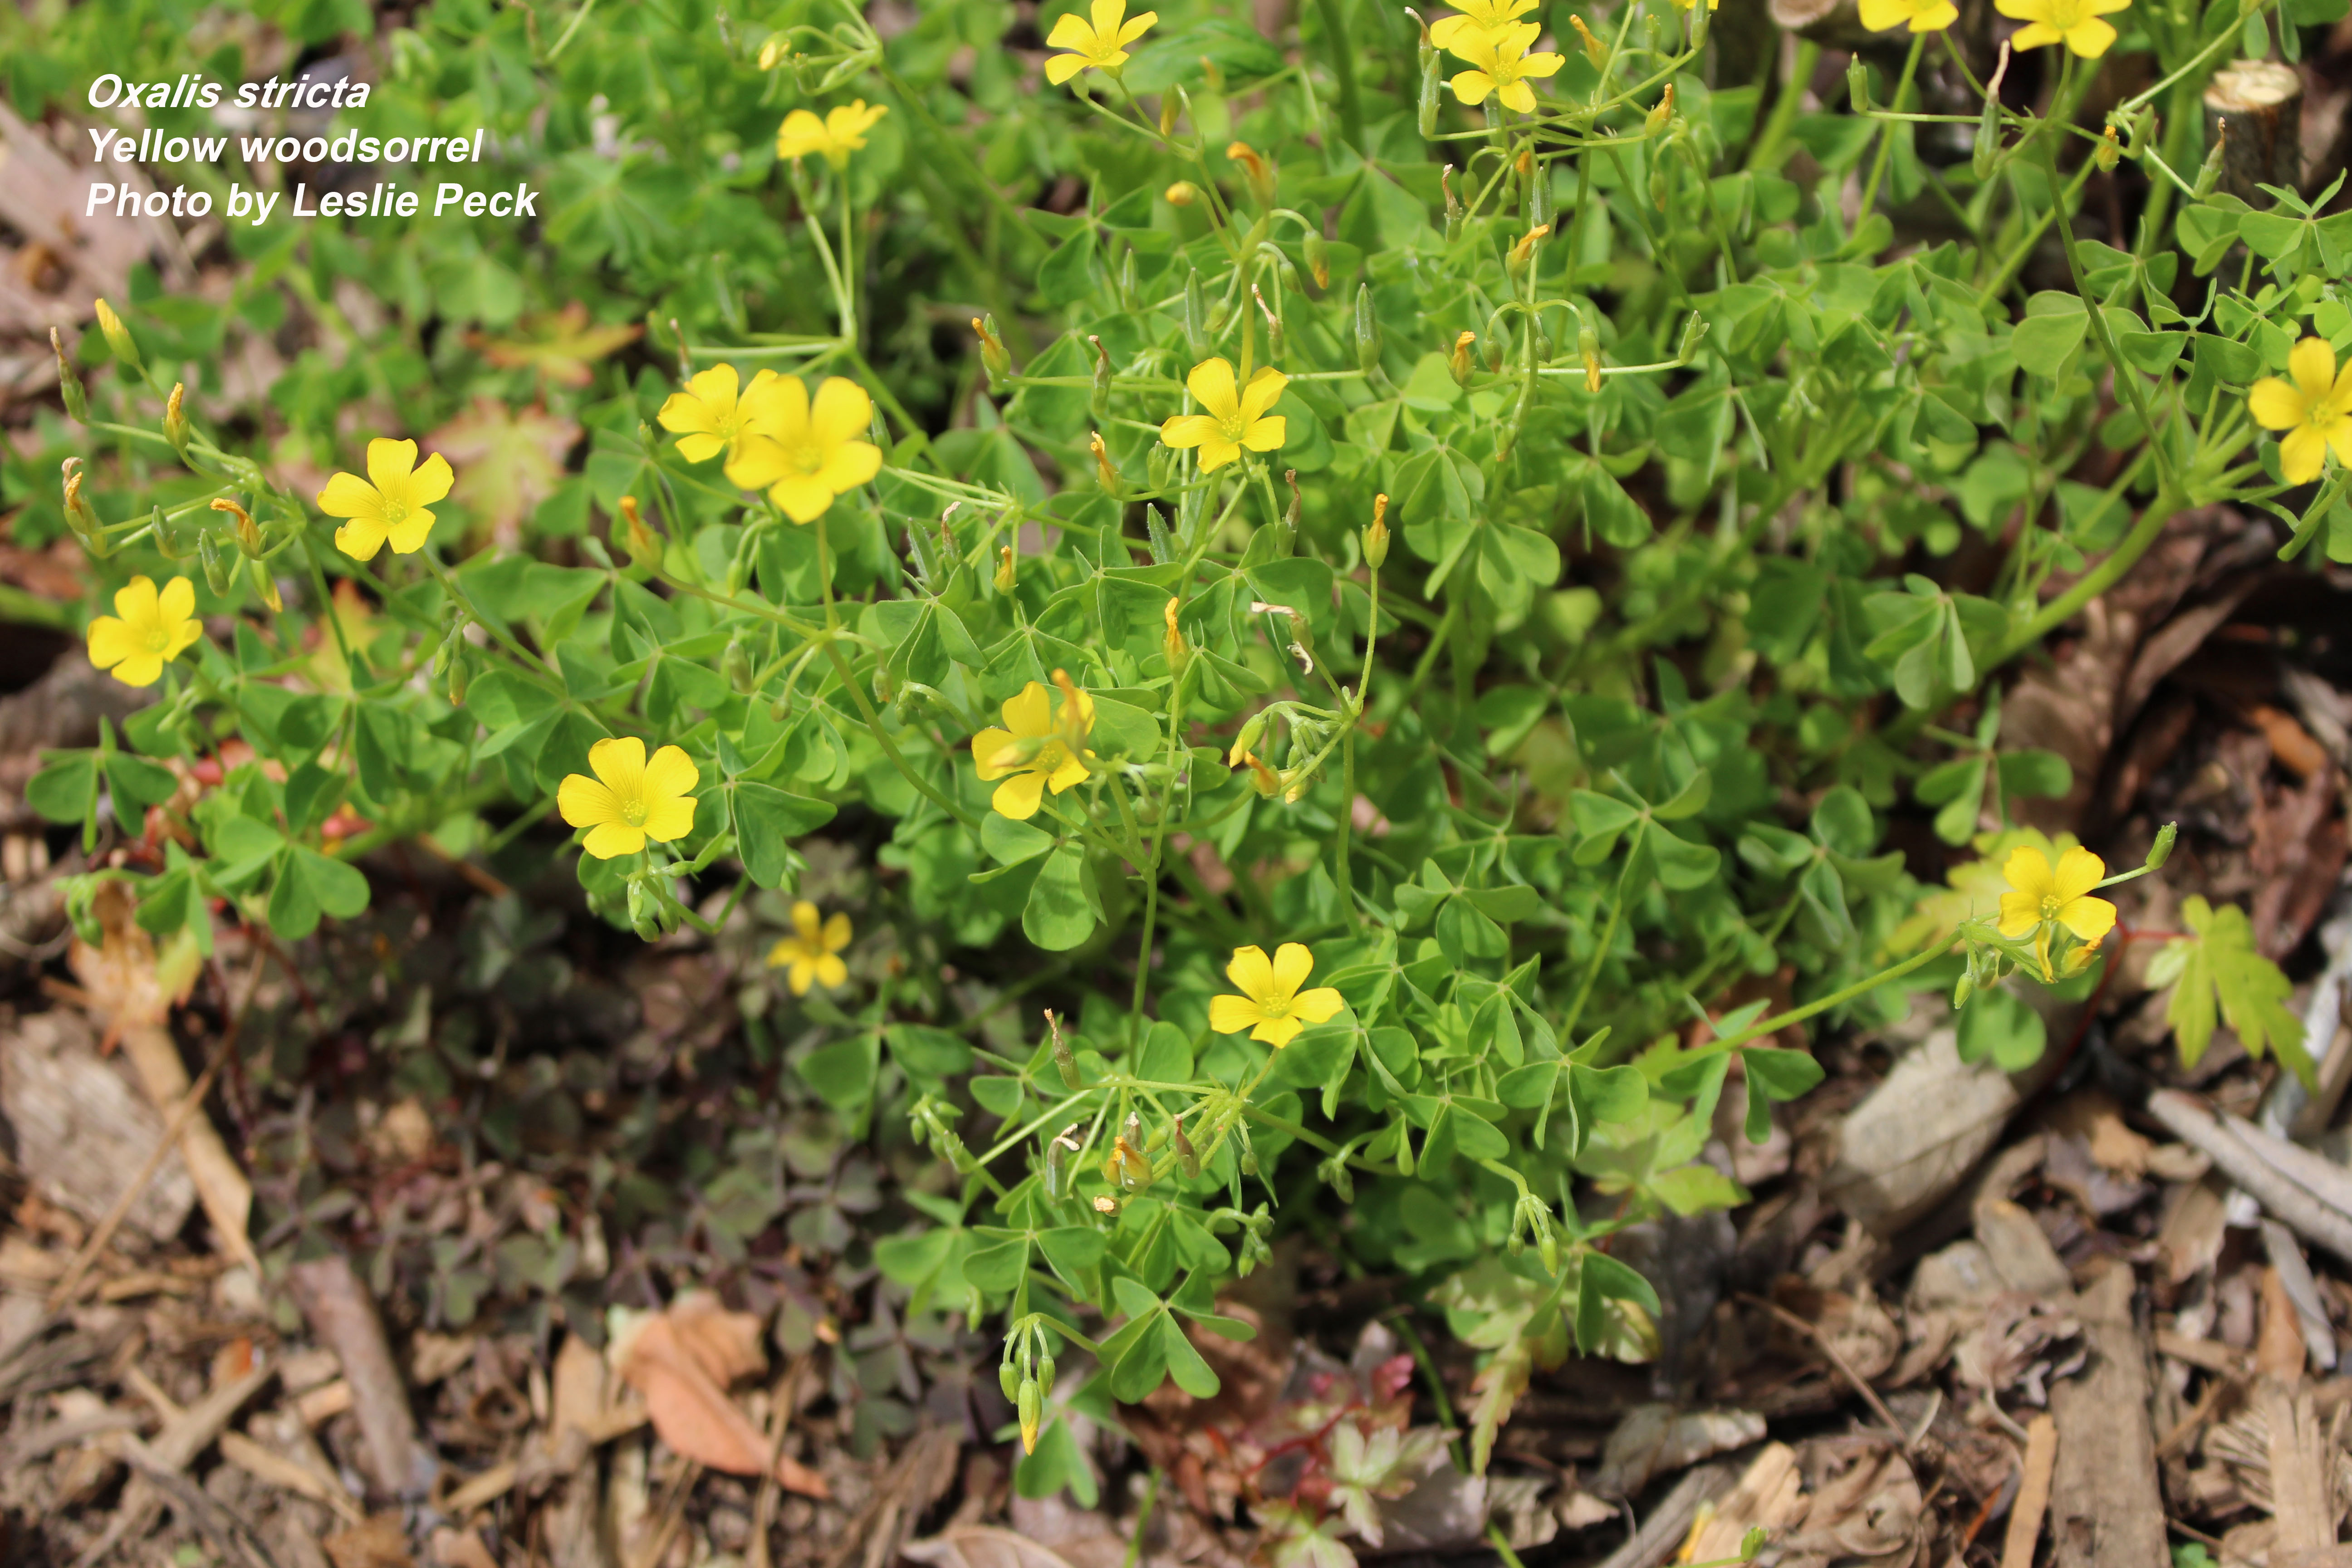 Woodsorrel flowers